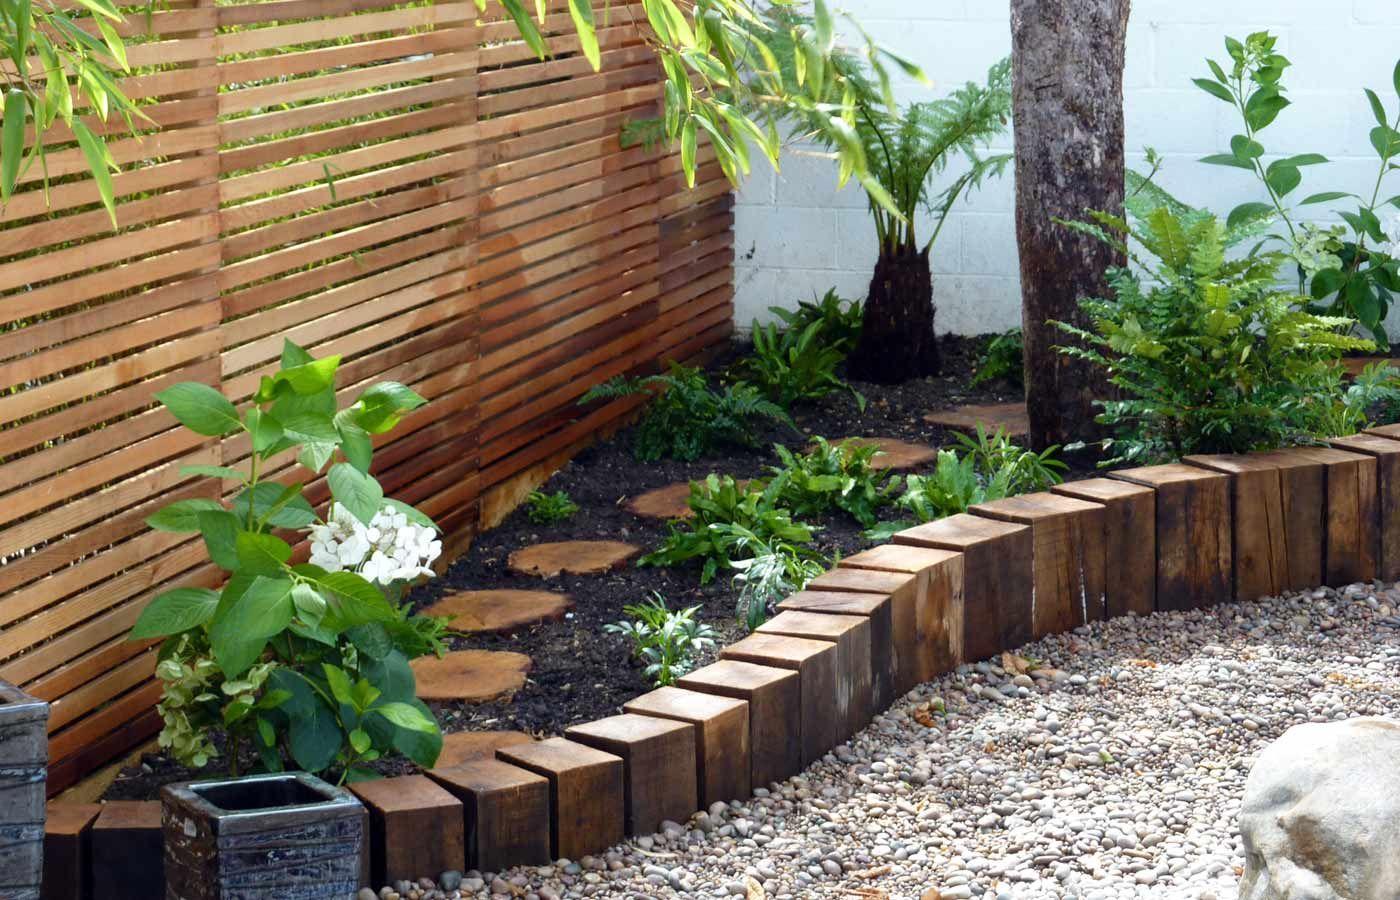 Wooden Stepping Stones Amongst The Plants Garden Edging